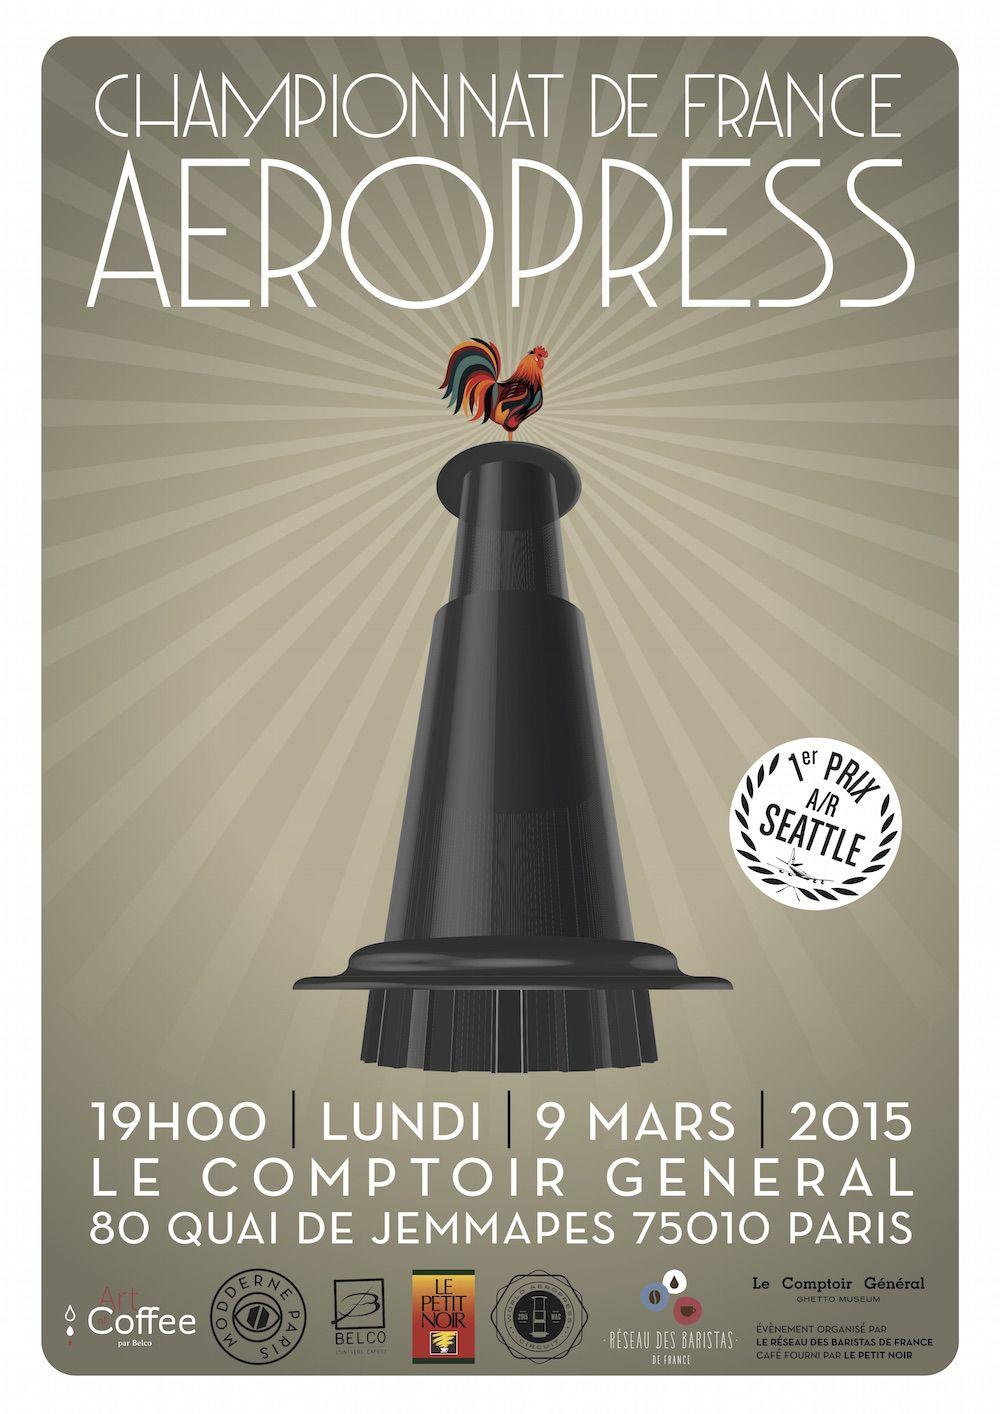 AeroPress x Art | Aeropress championship posters | Pinterest